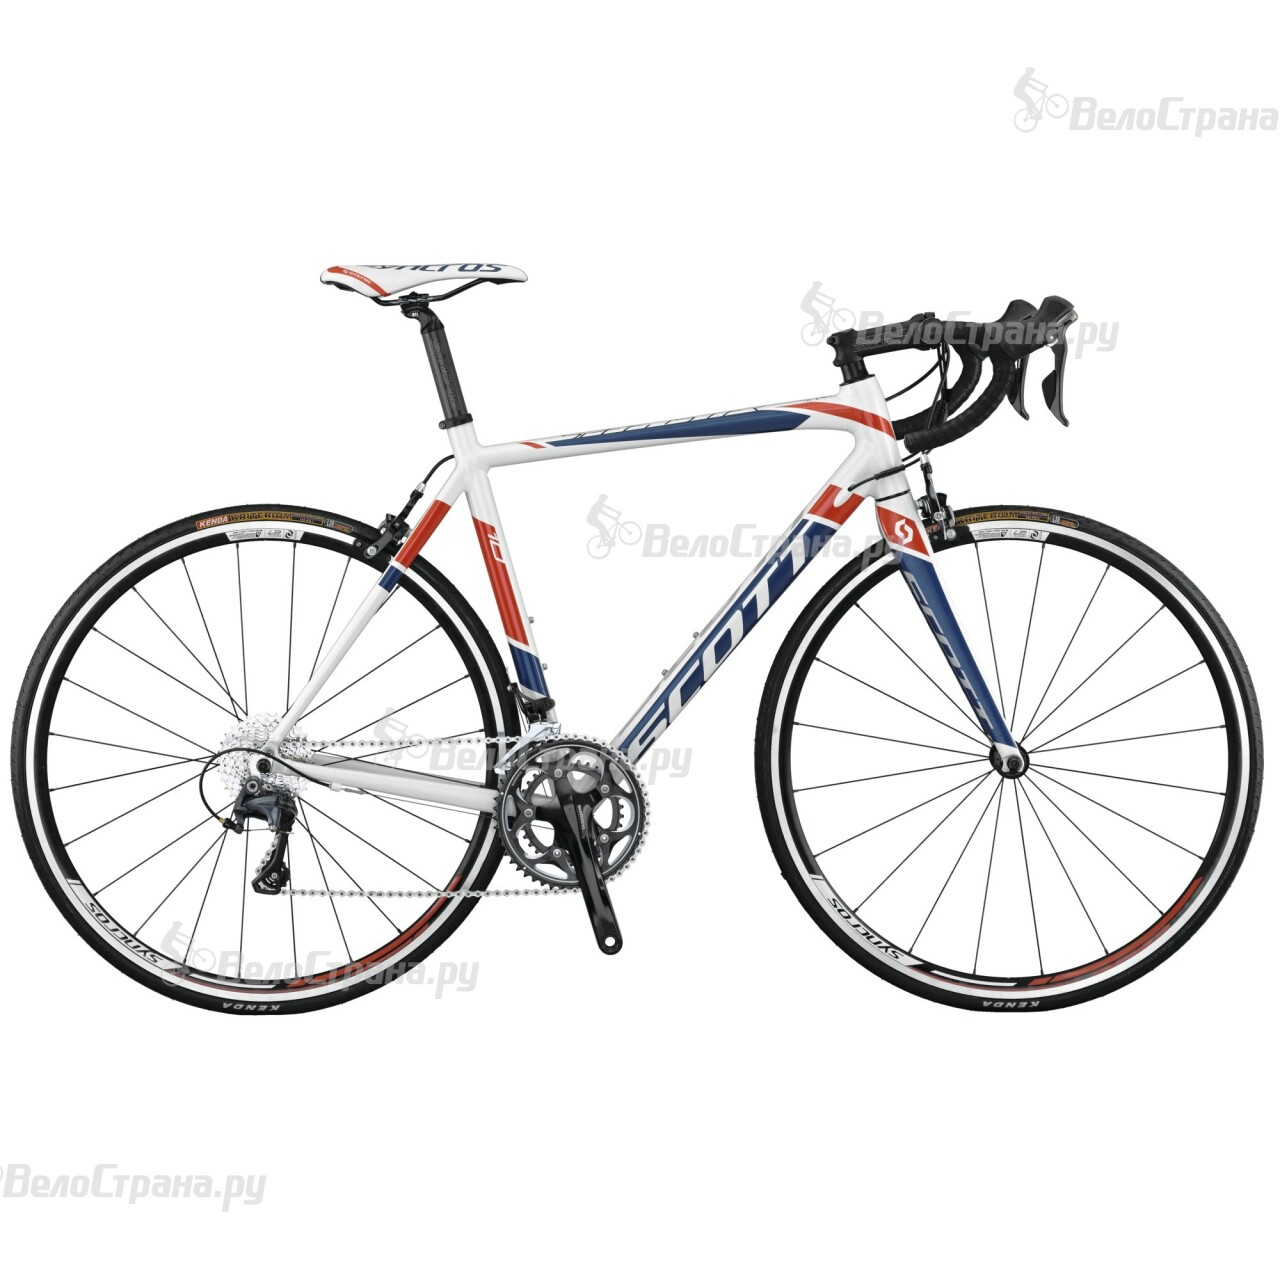 Велосипед Scott Speedster 10 Compact (2015) scott addict sl compact 2015